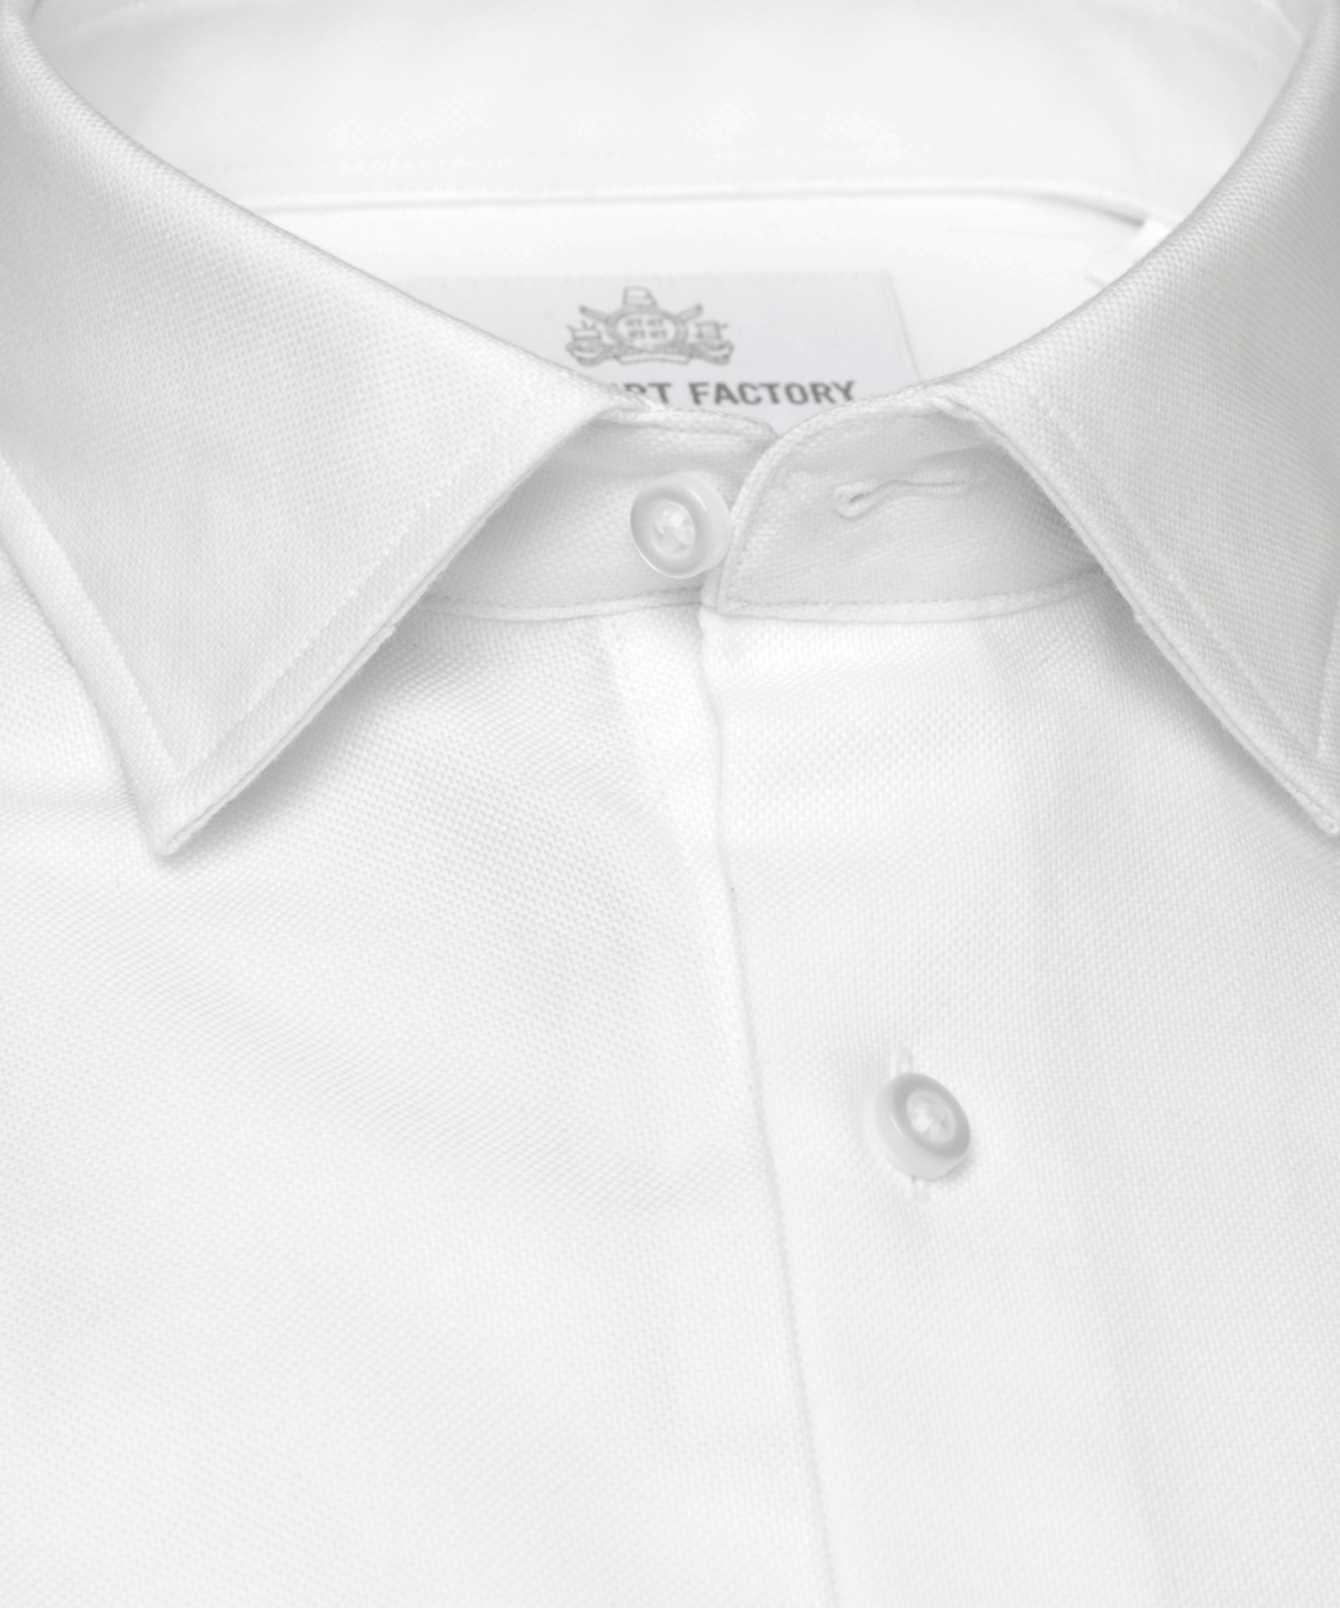 Skjorta Stanton The Shirt Factory